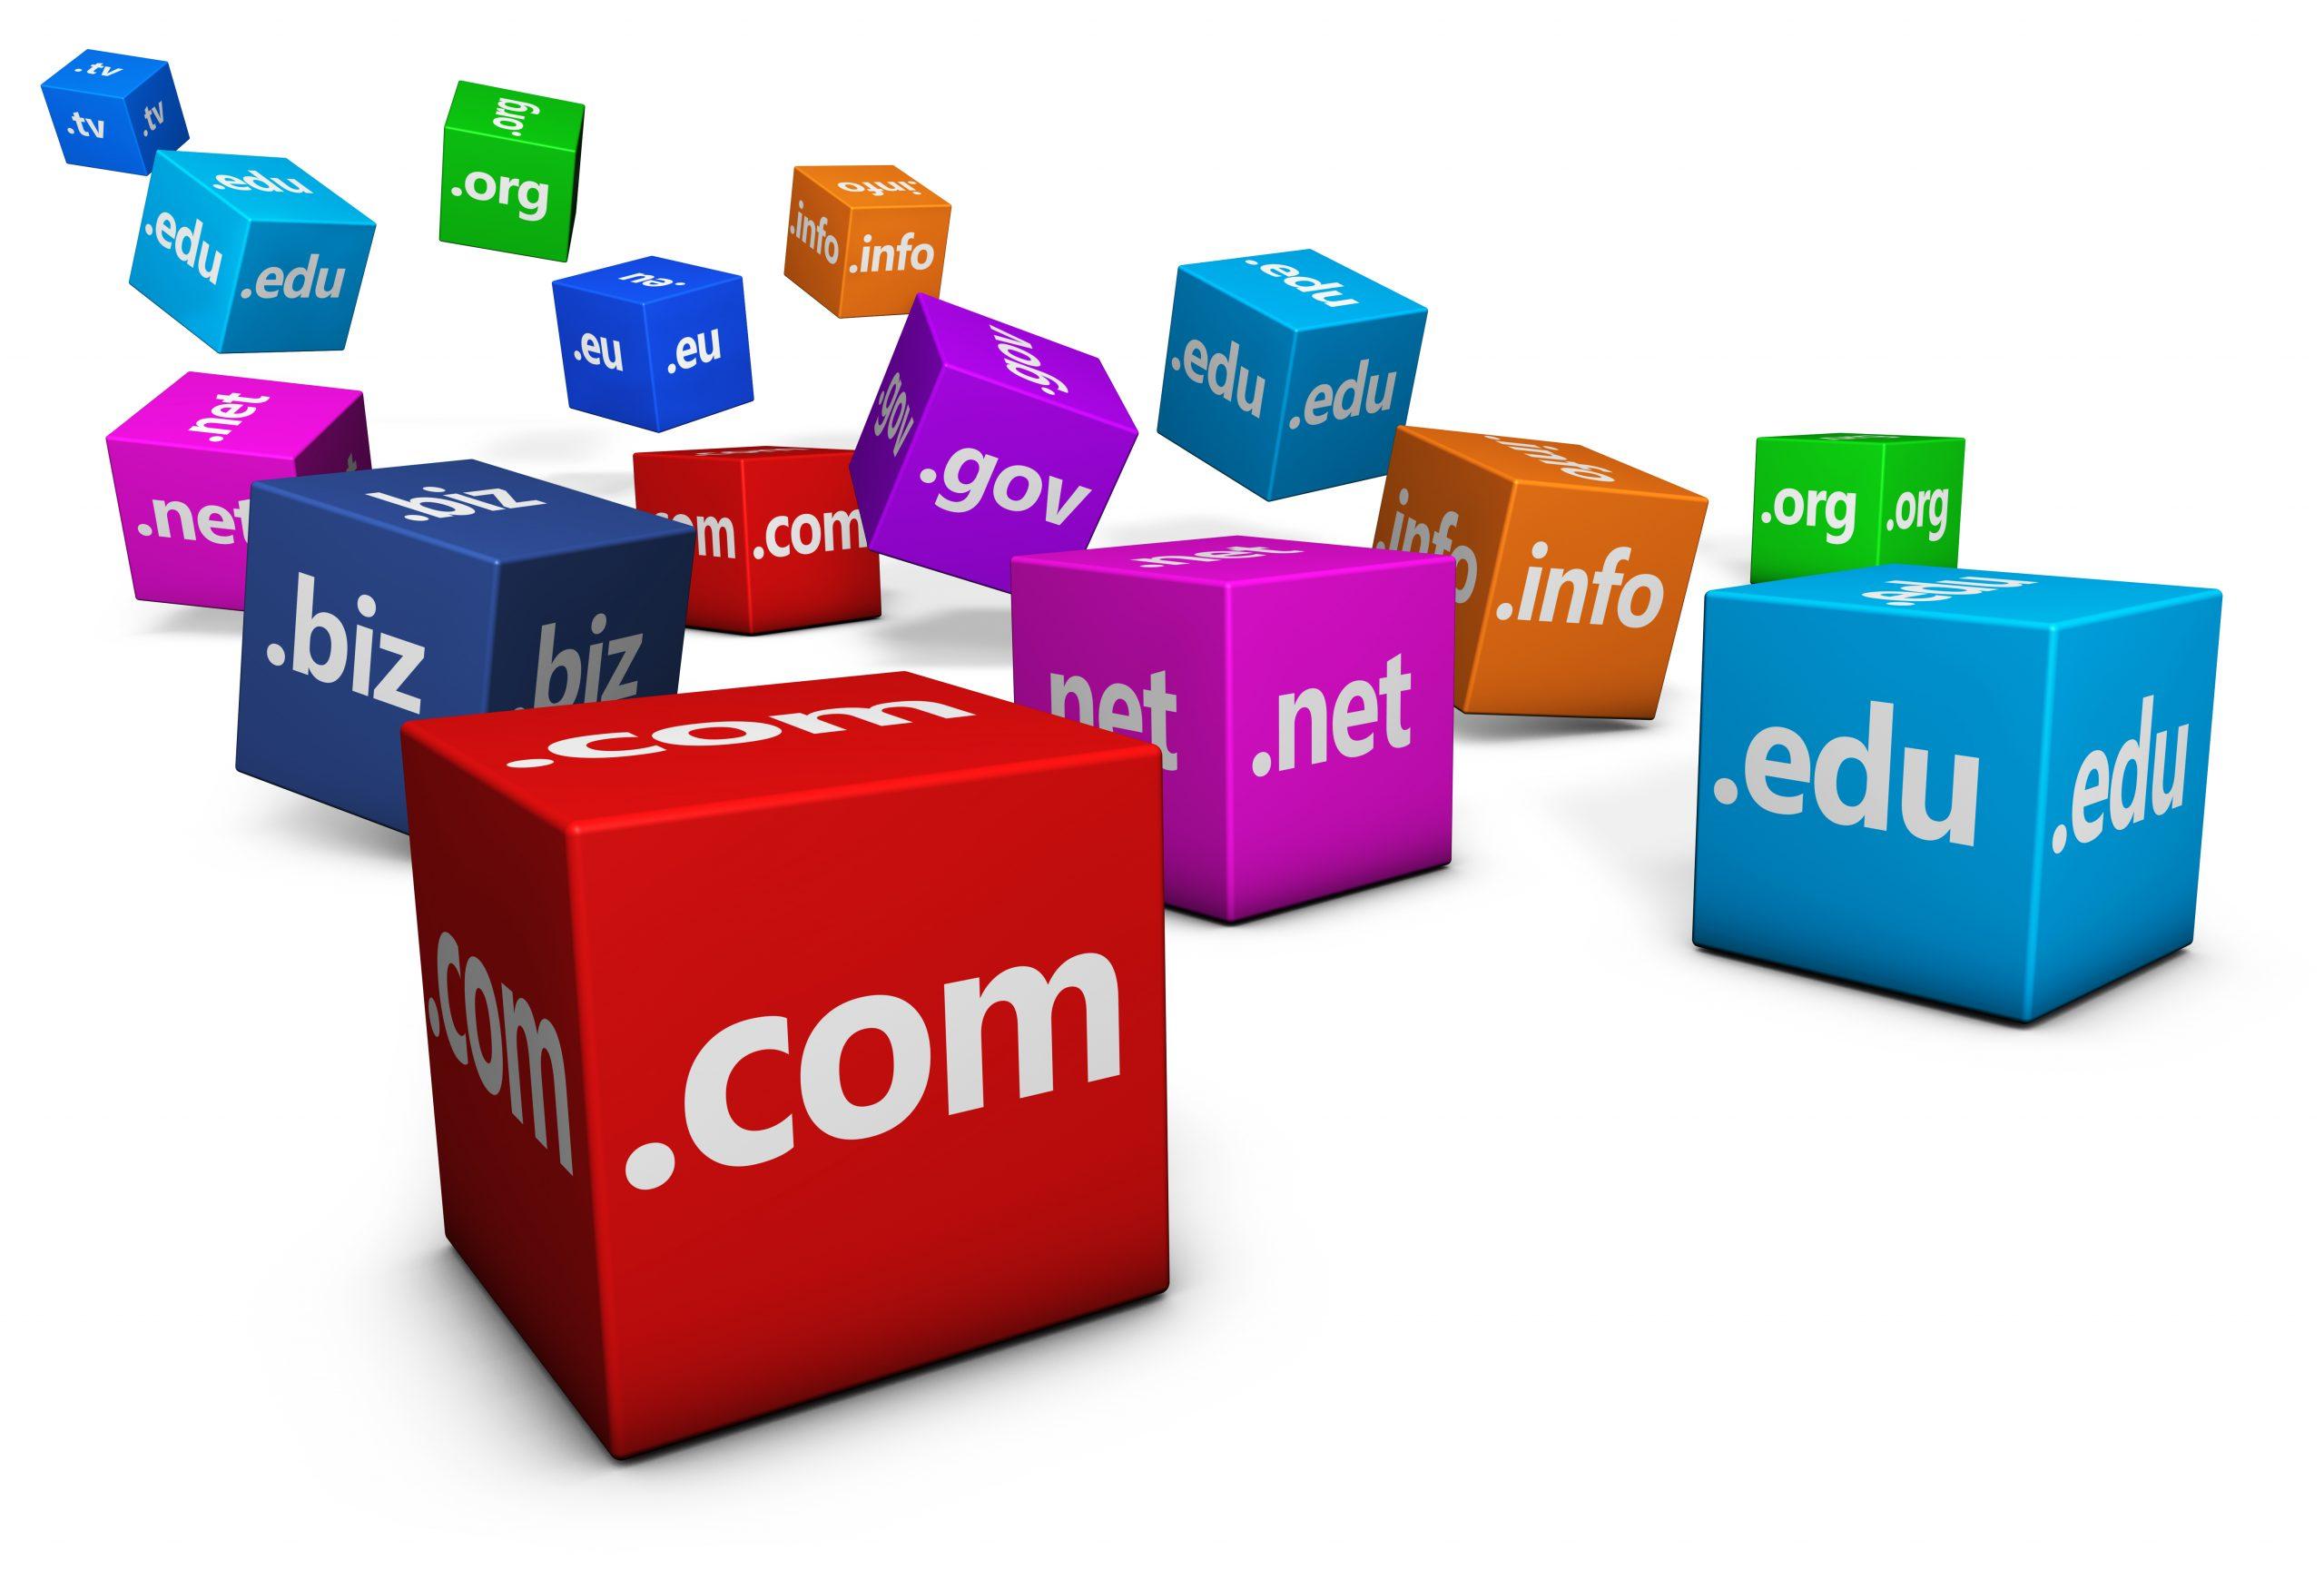 Domain Flipping makes huge money online see how at jenbaucom.com. #domainflipping #makemoneyonline #domainflipper